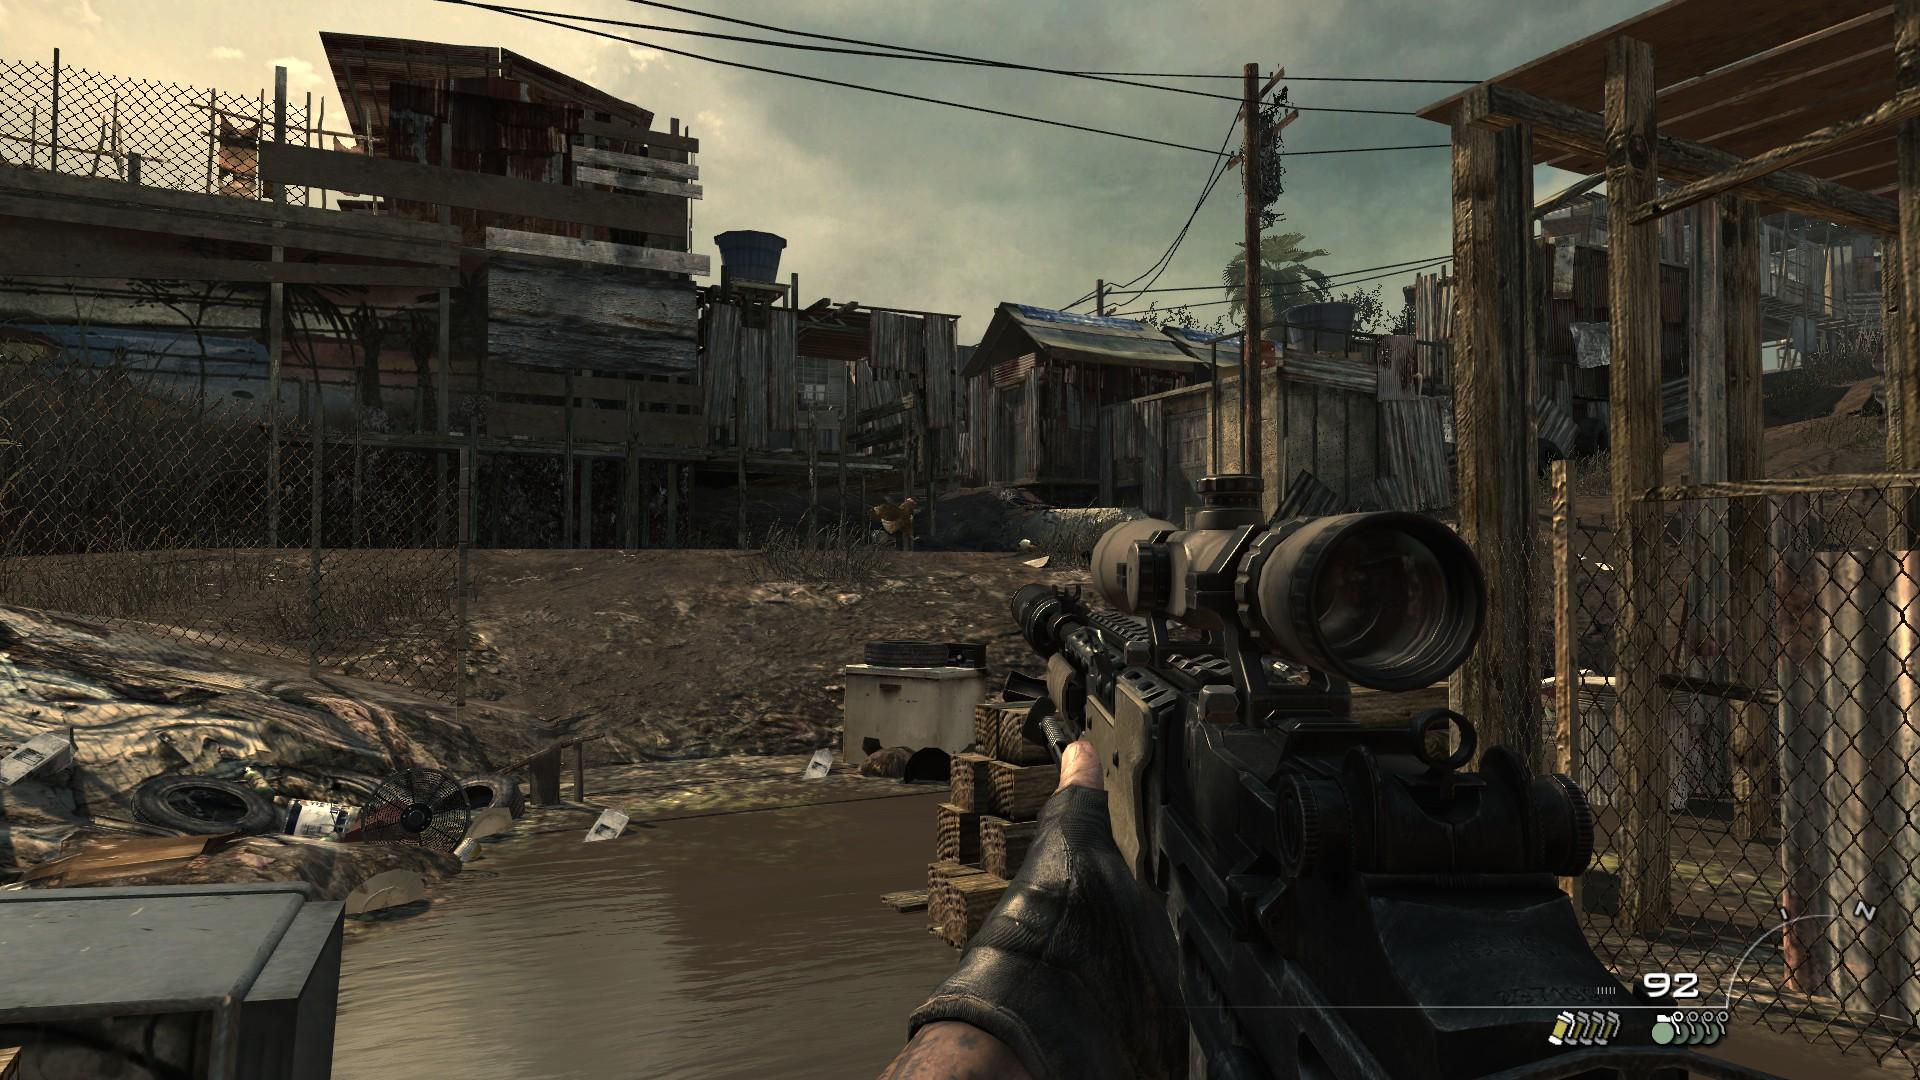 Call of Duty: Modern Warfare 3 | The Infinite Zenith